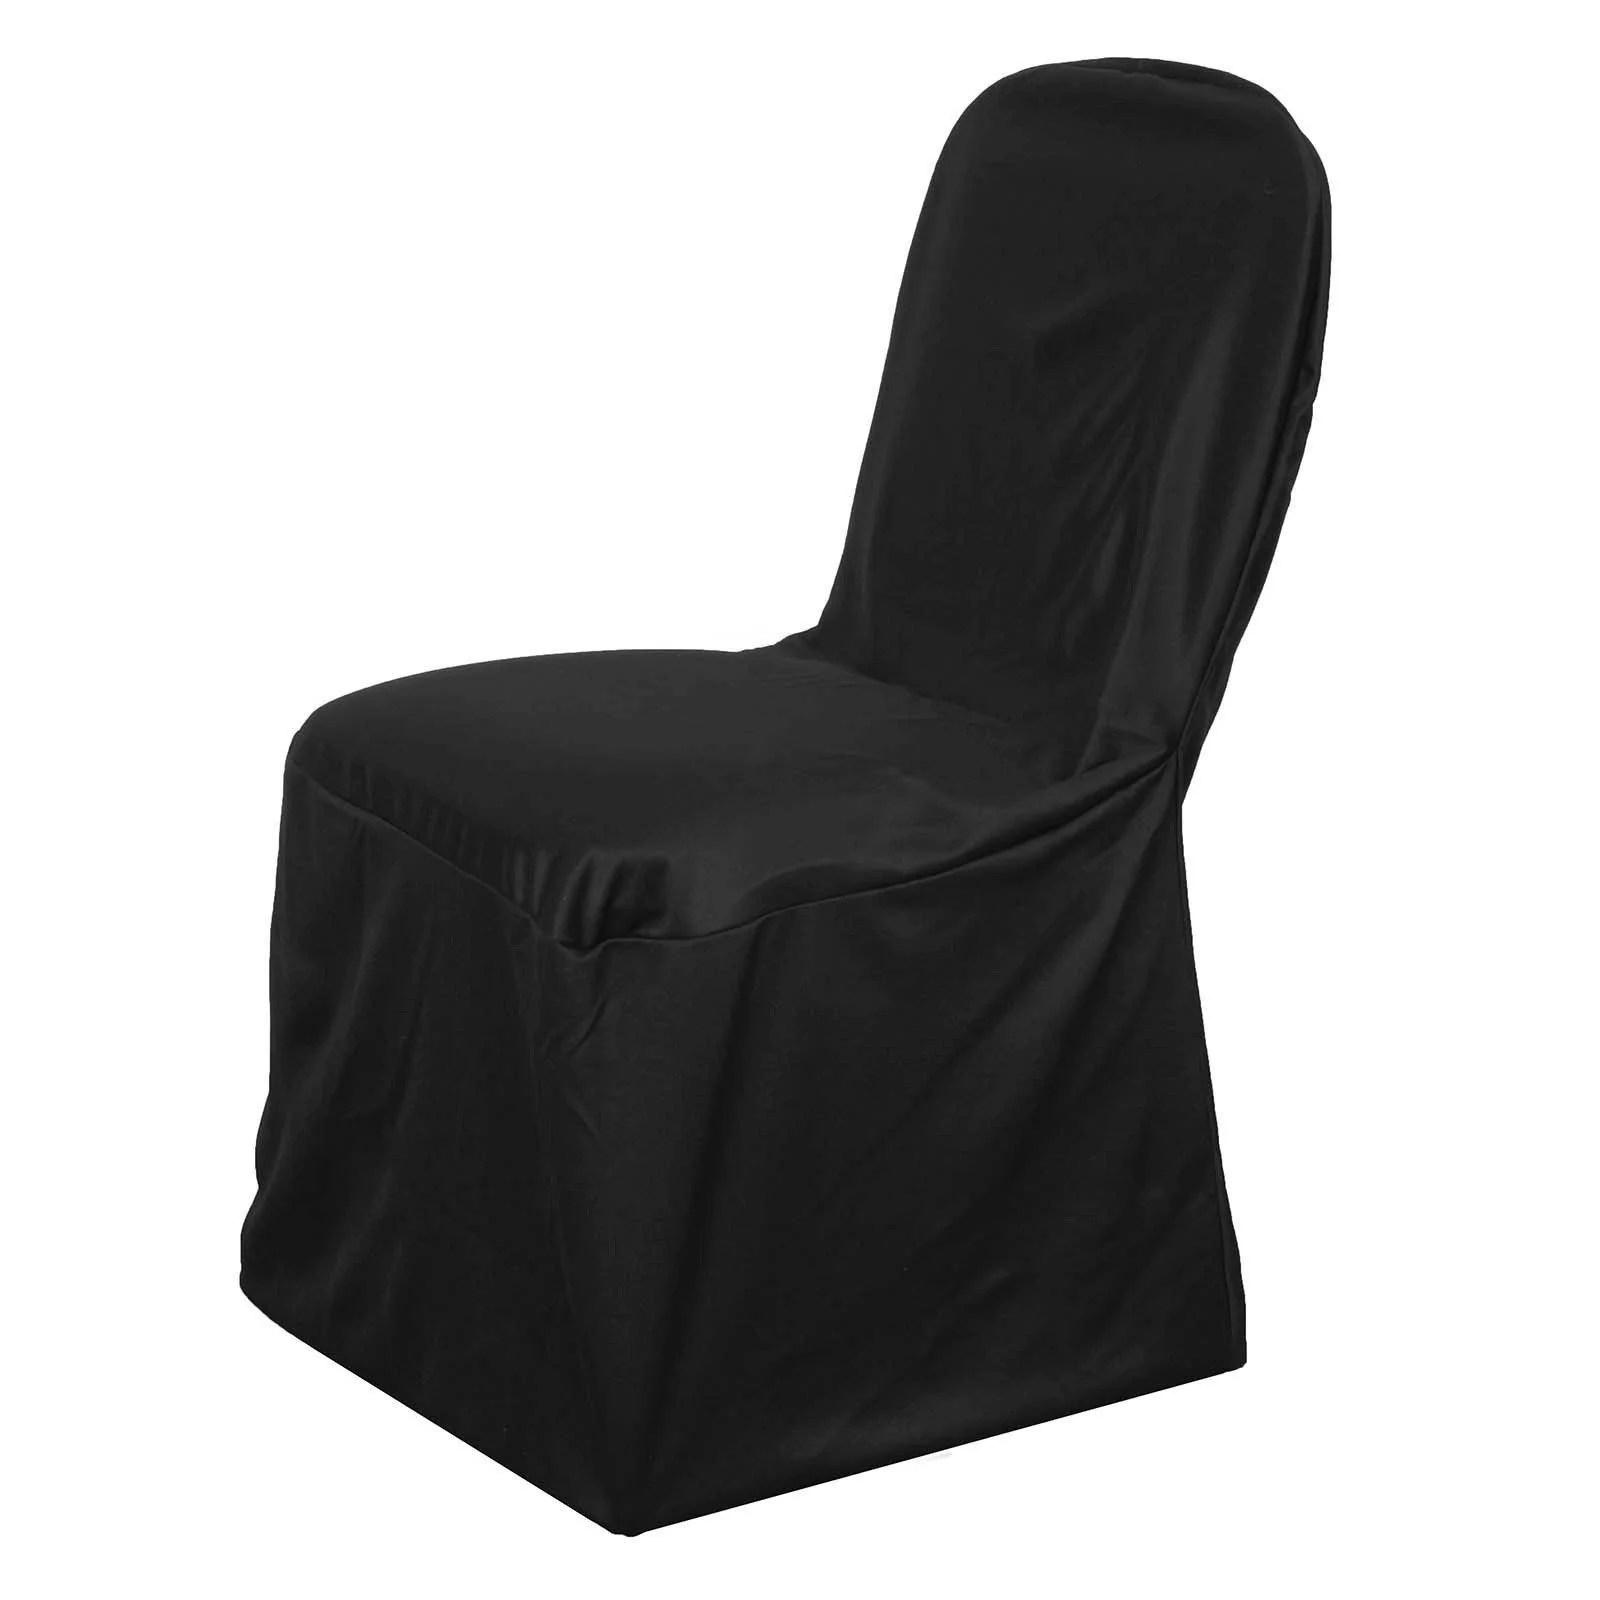 black chair covers ebay bathtub lift stretch scuba tablecloths factory